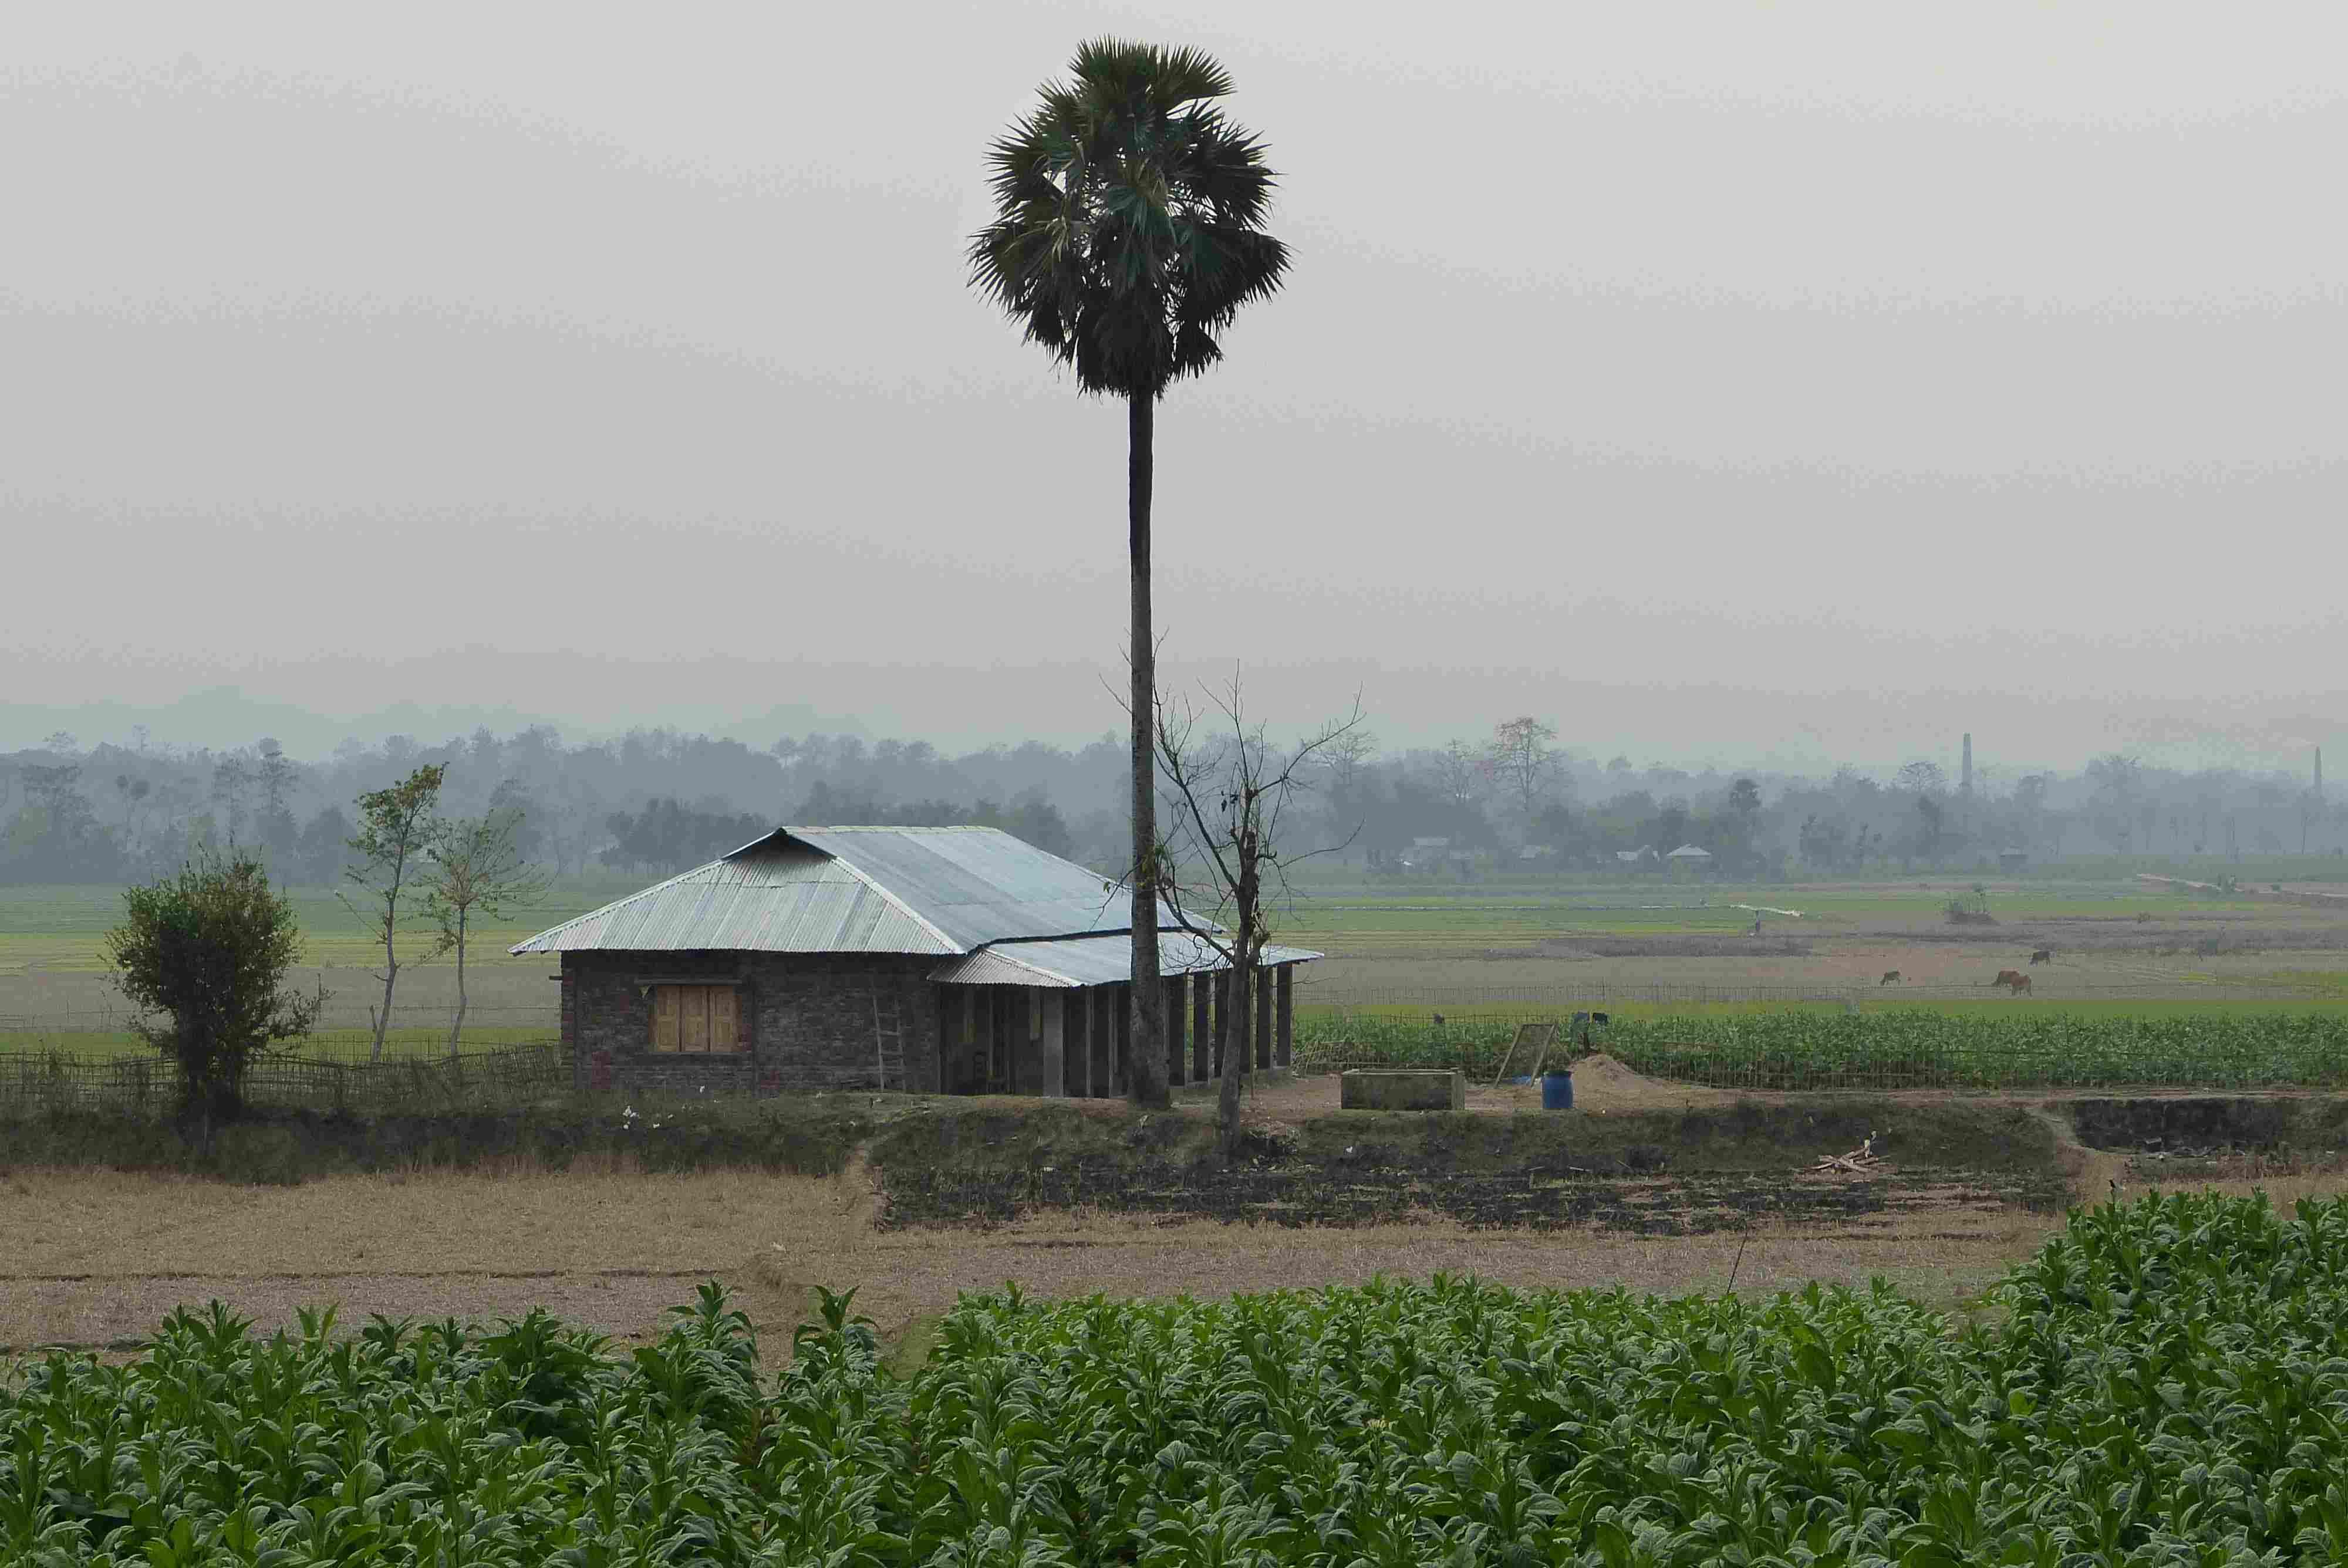 le collège de Tarabunia, petit village isolé du Bangladesh